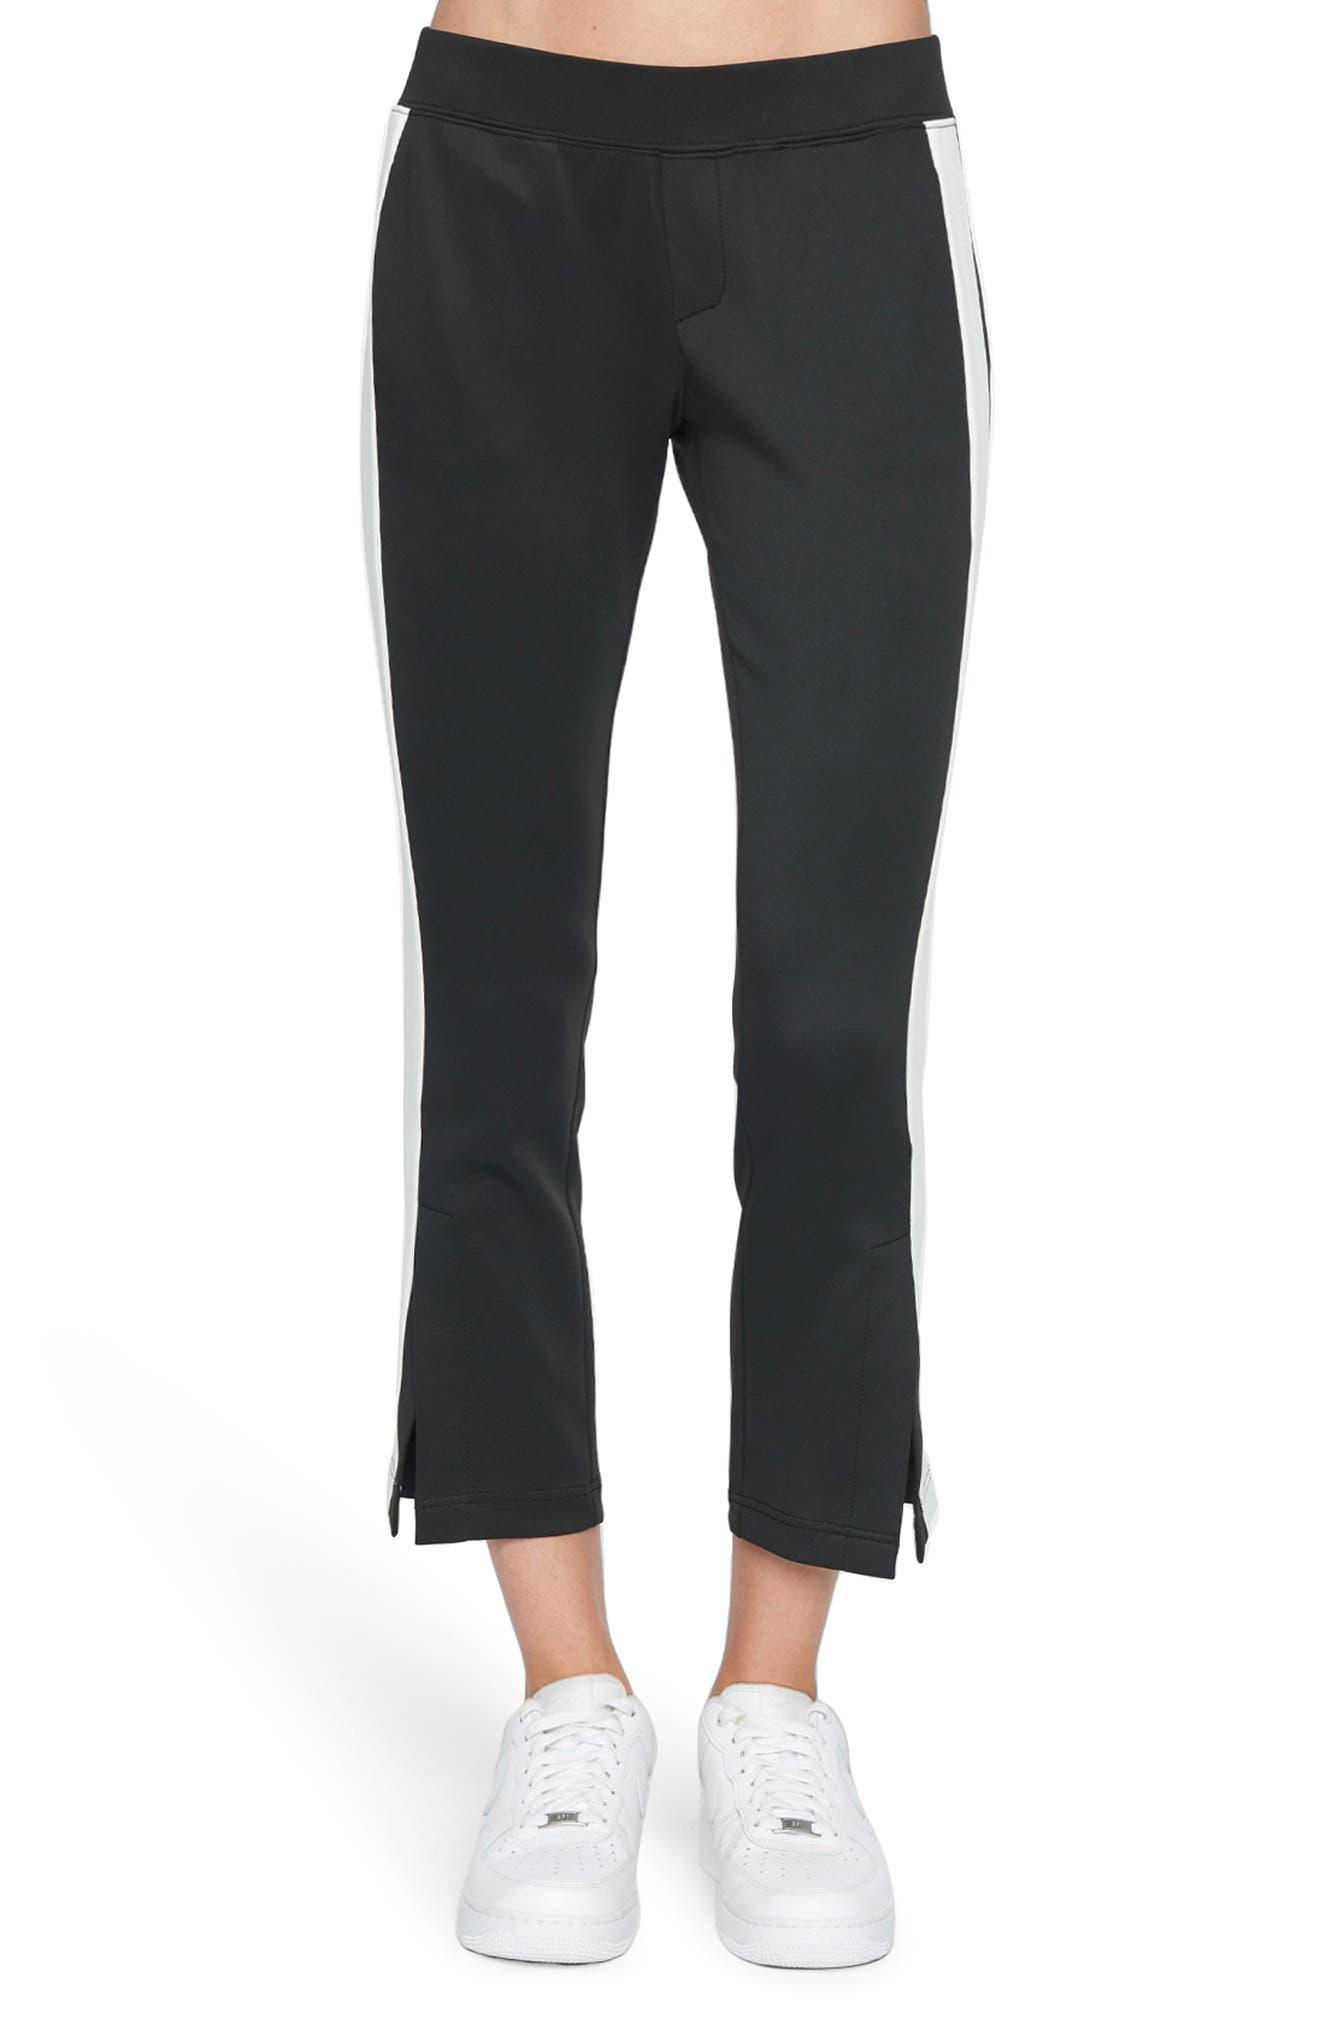 Women's Pam & Gela Crop Track Pants,  Petite - Black